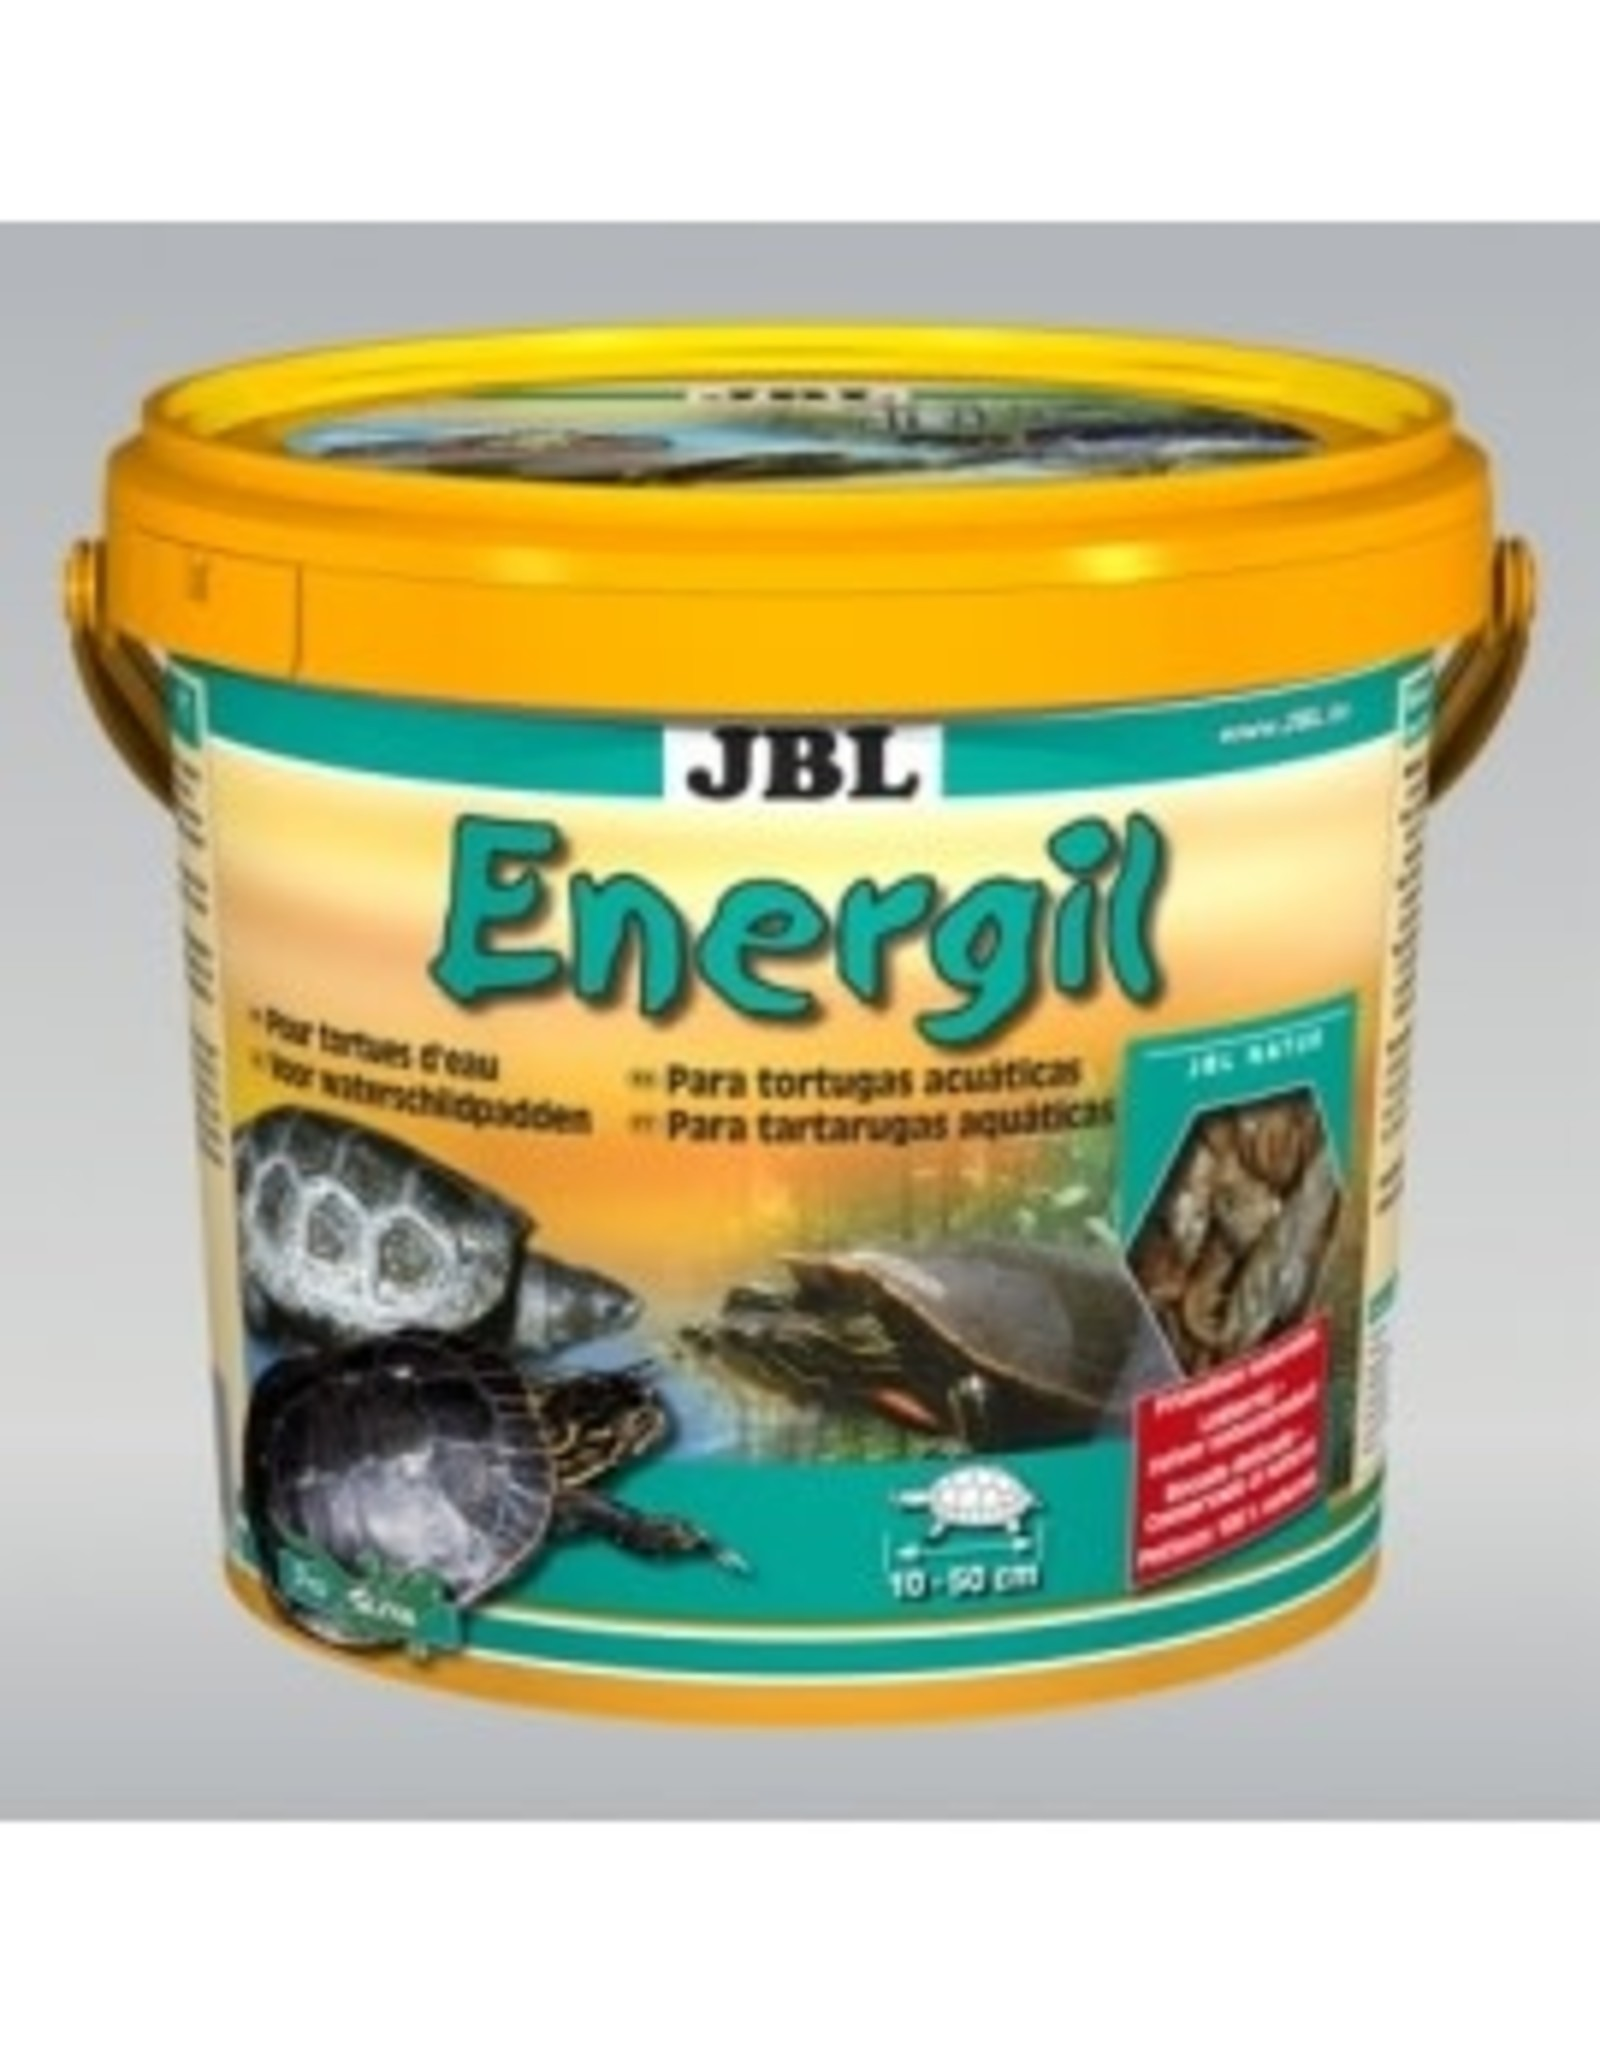 JBL ENERGIL JBL pr tortue